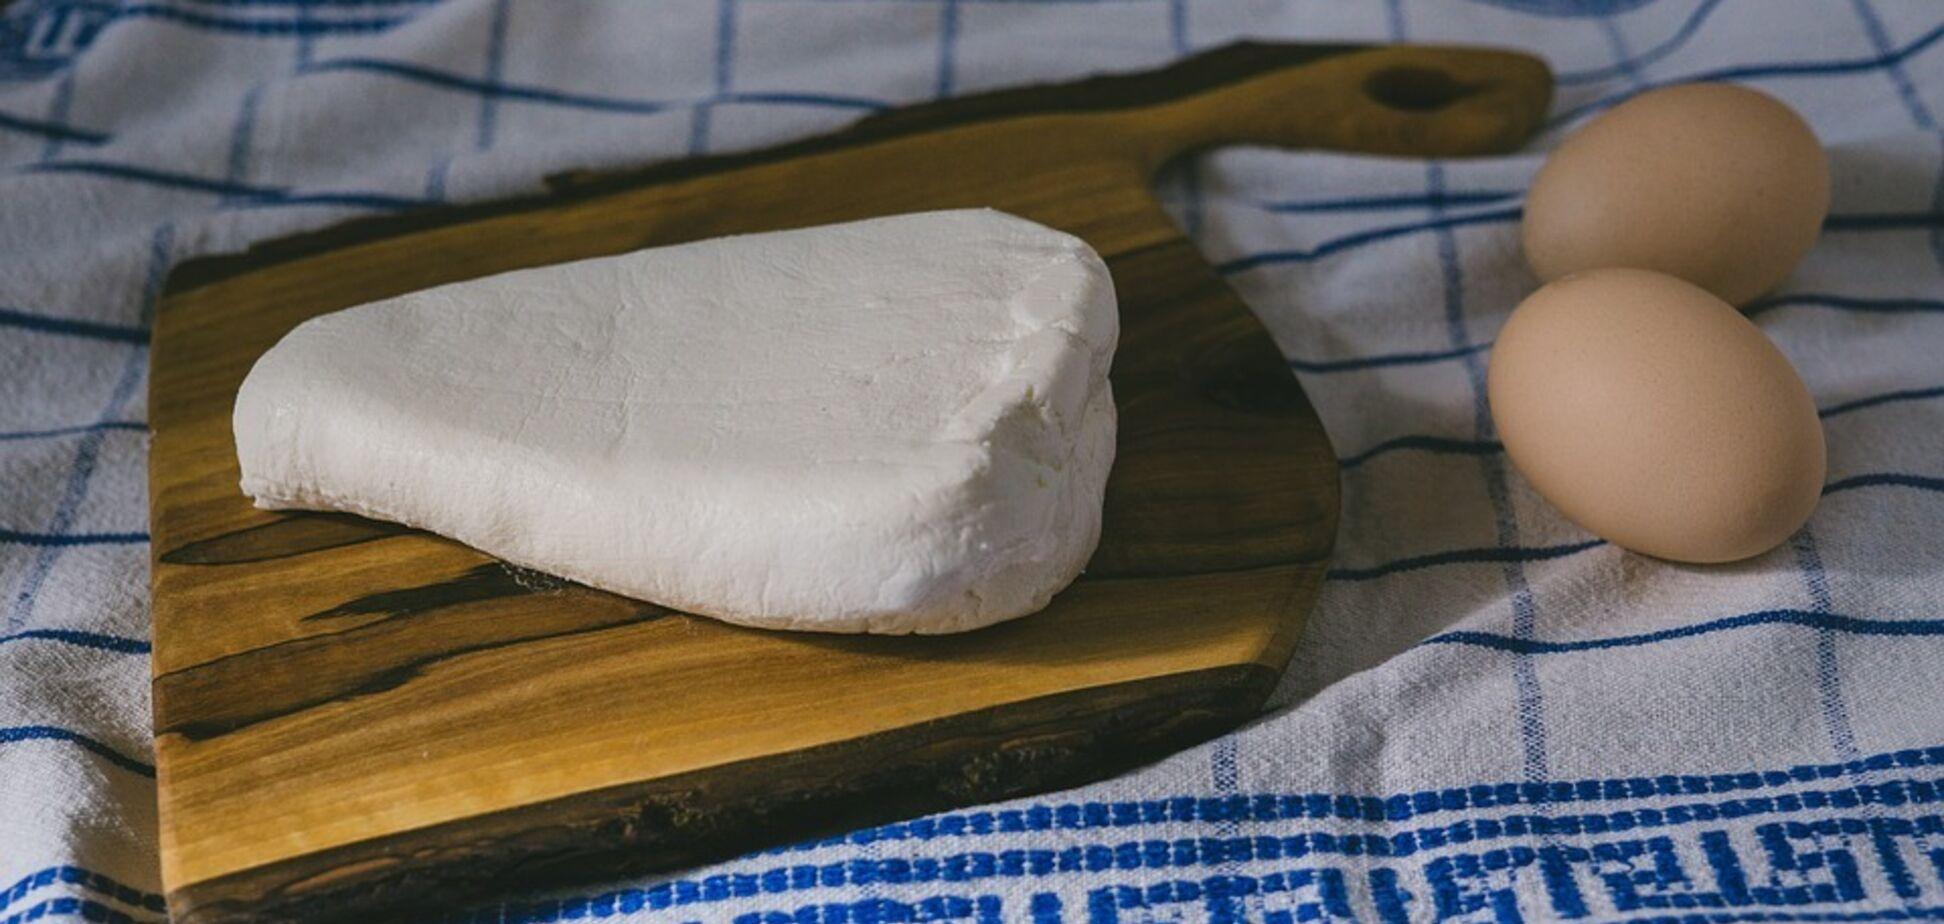 Рецепт простого, але дуже смачного десерту на свято і кожен день